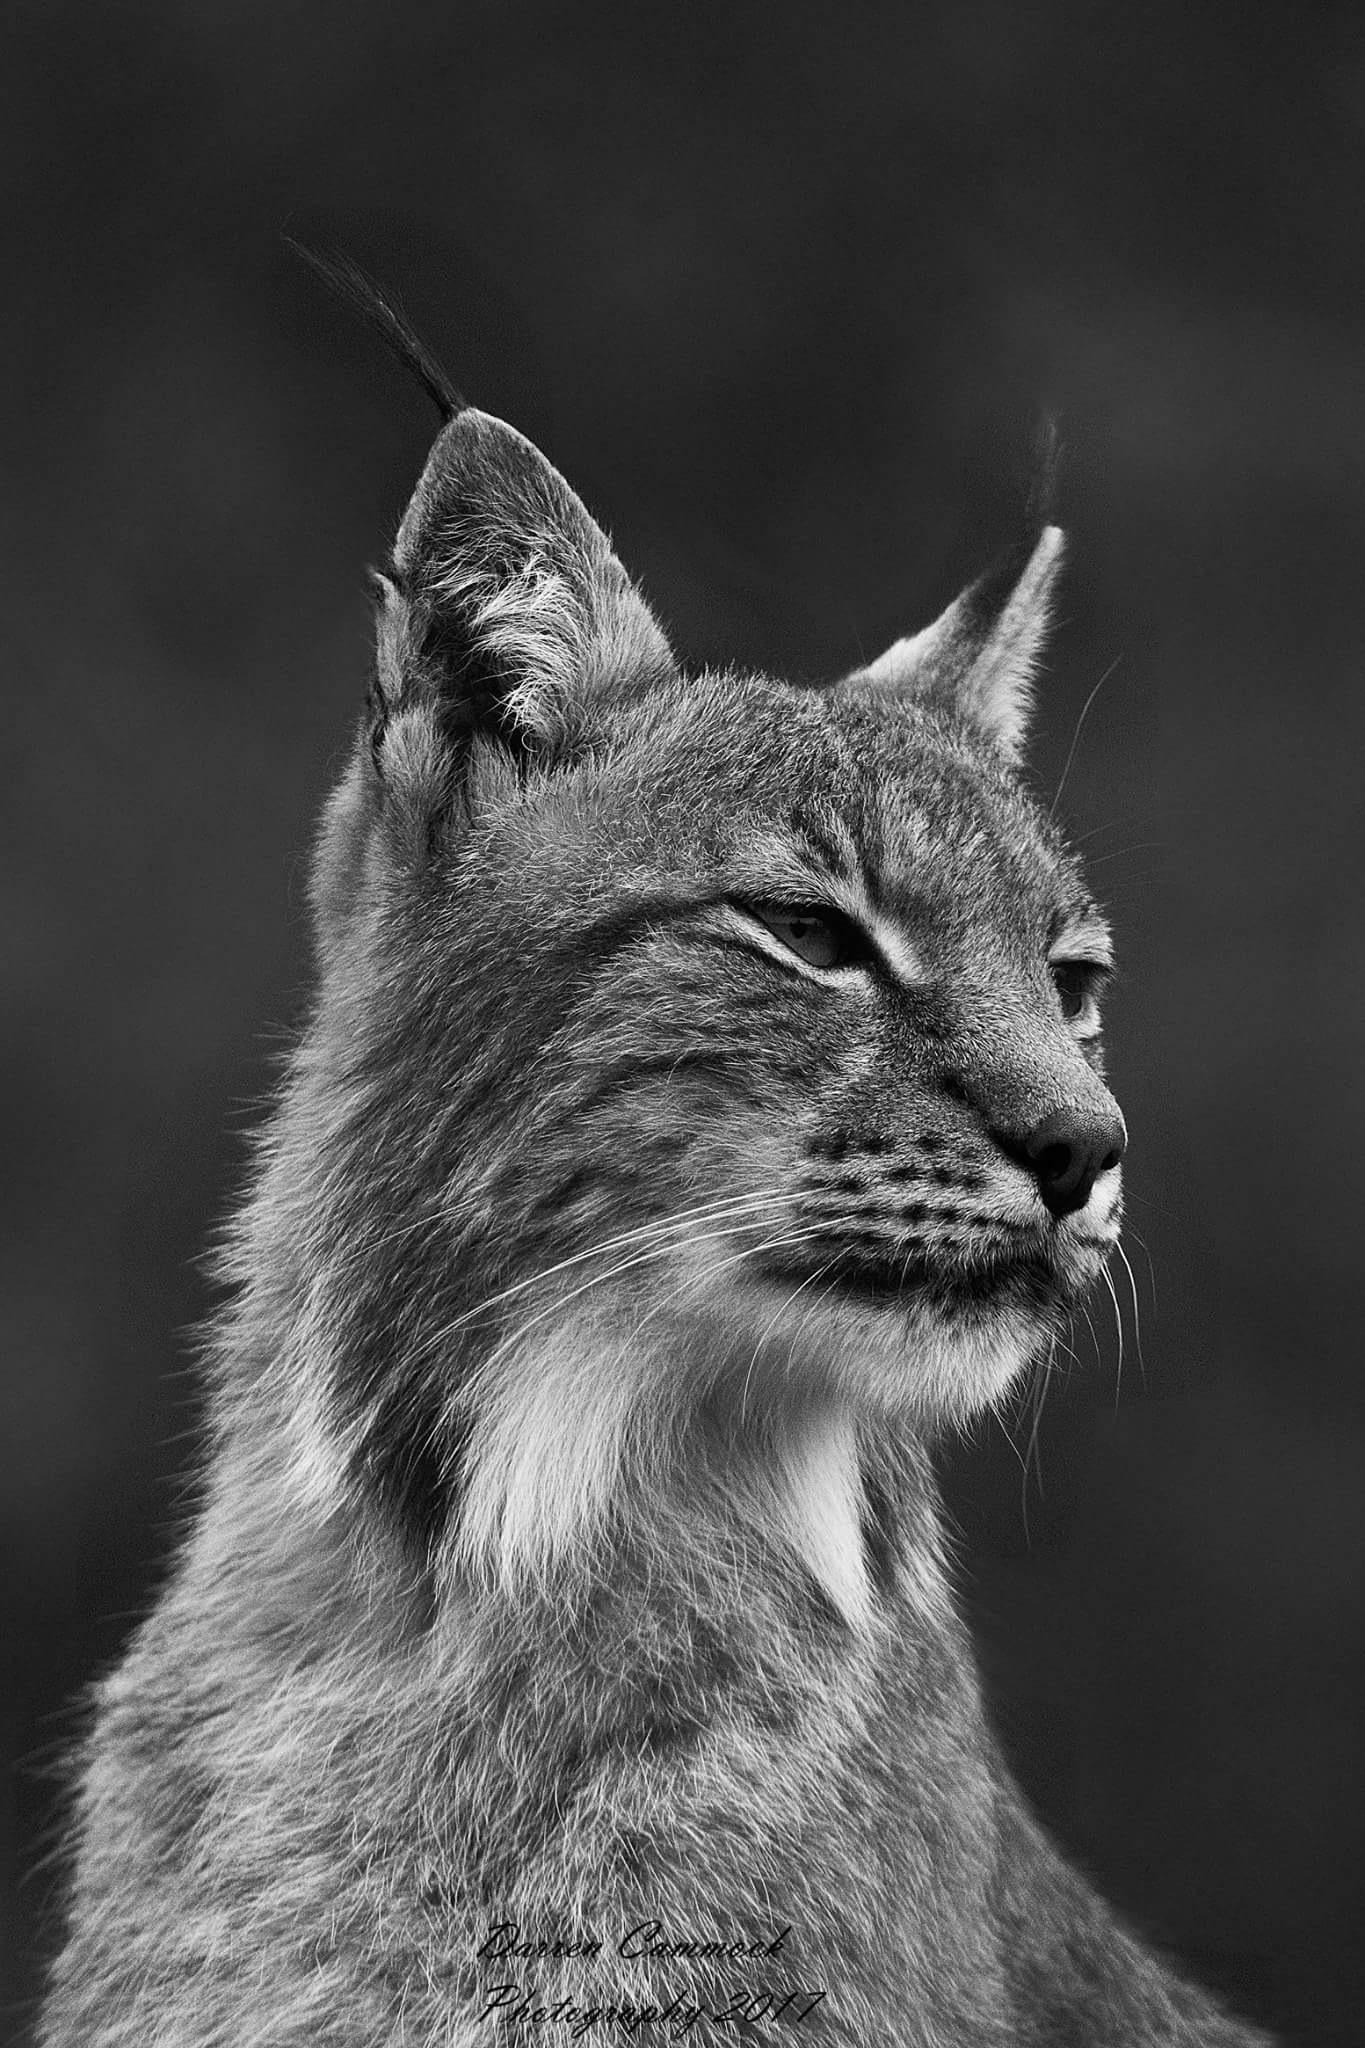 Eurasian Lynx by darrencammock